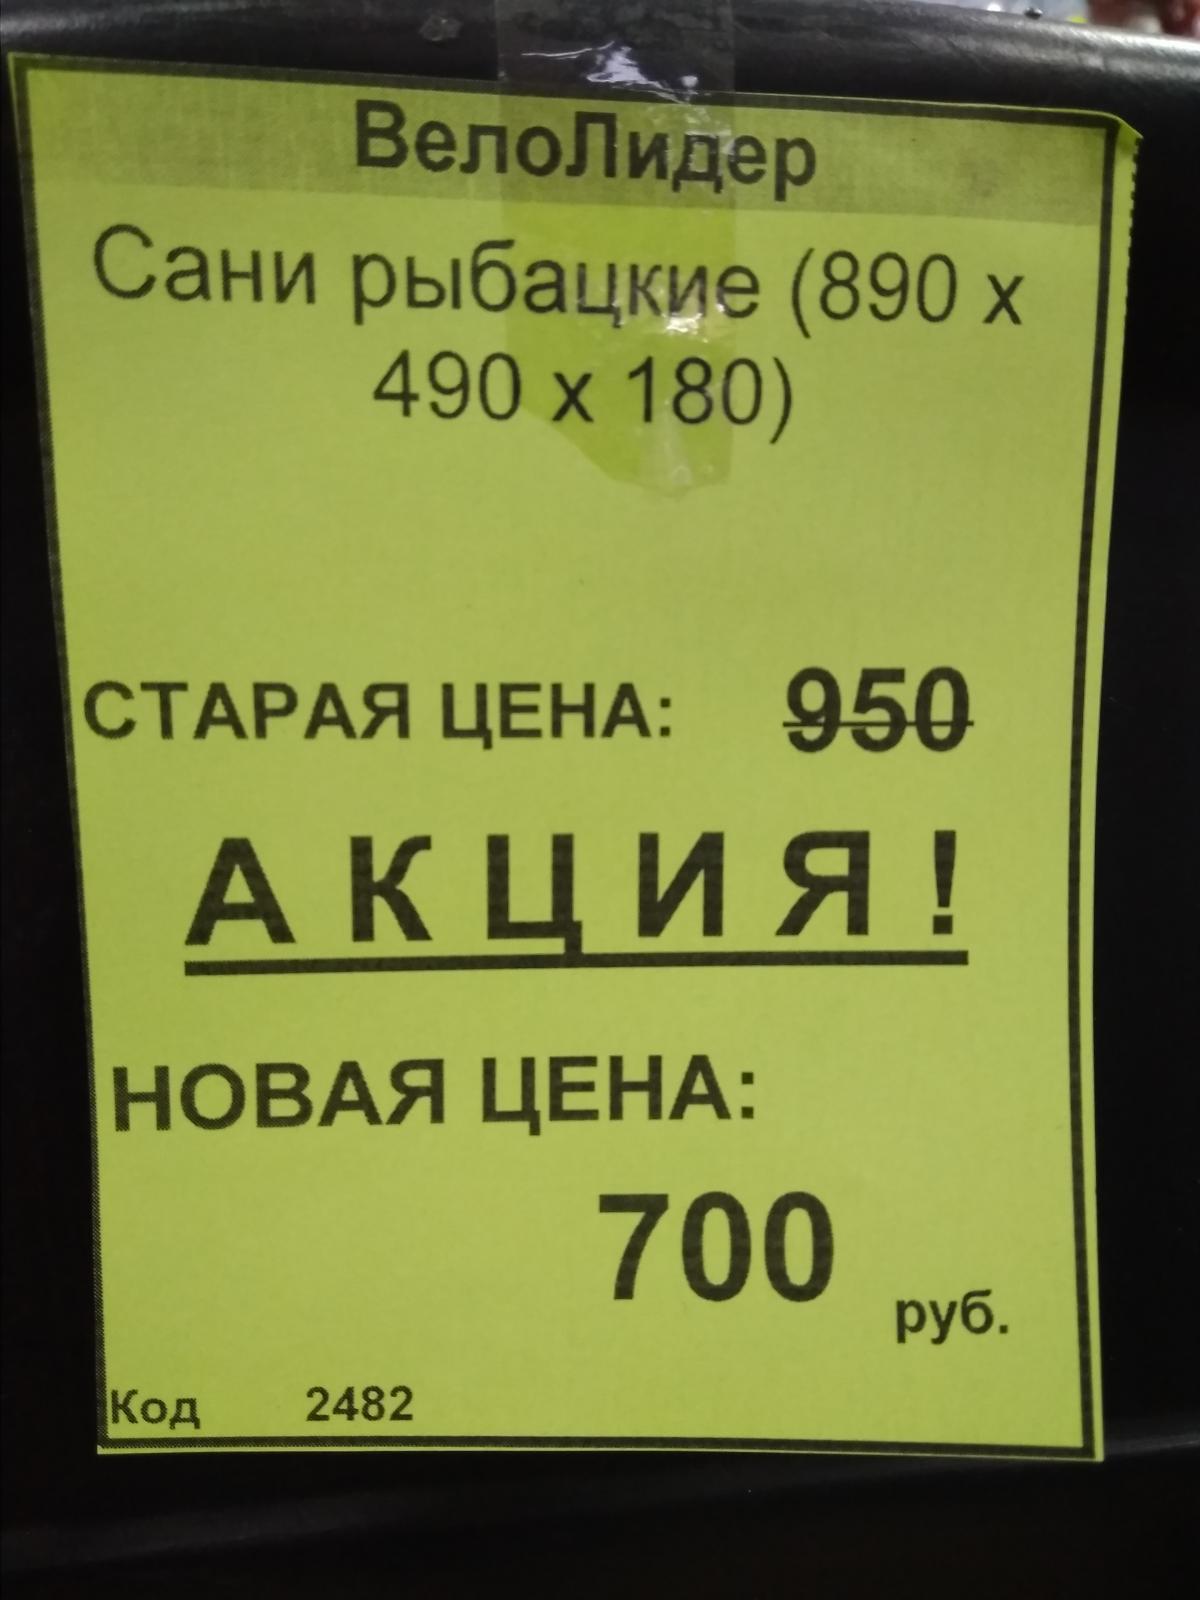 http://s2.moifotki.org/d2ee94d40a177b5eacc4dc60634b1e8a.jpeg